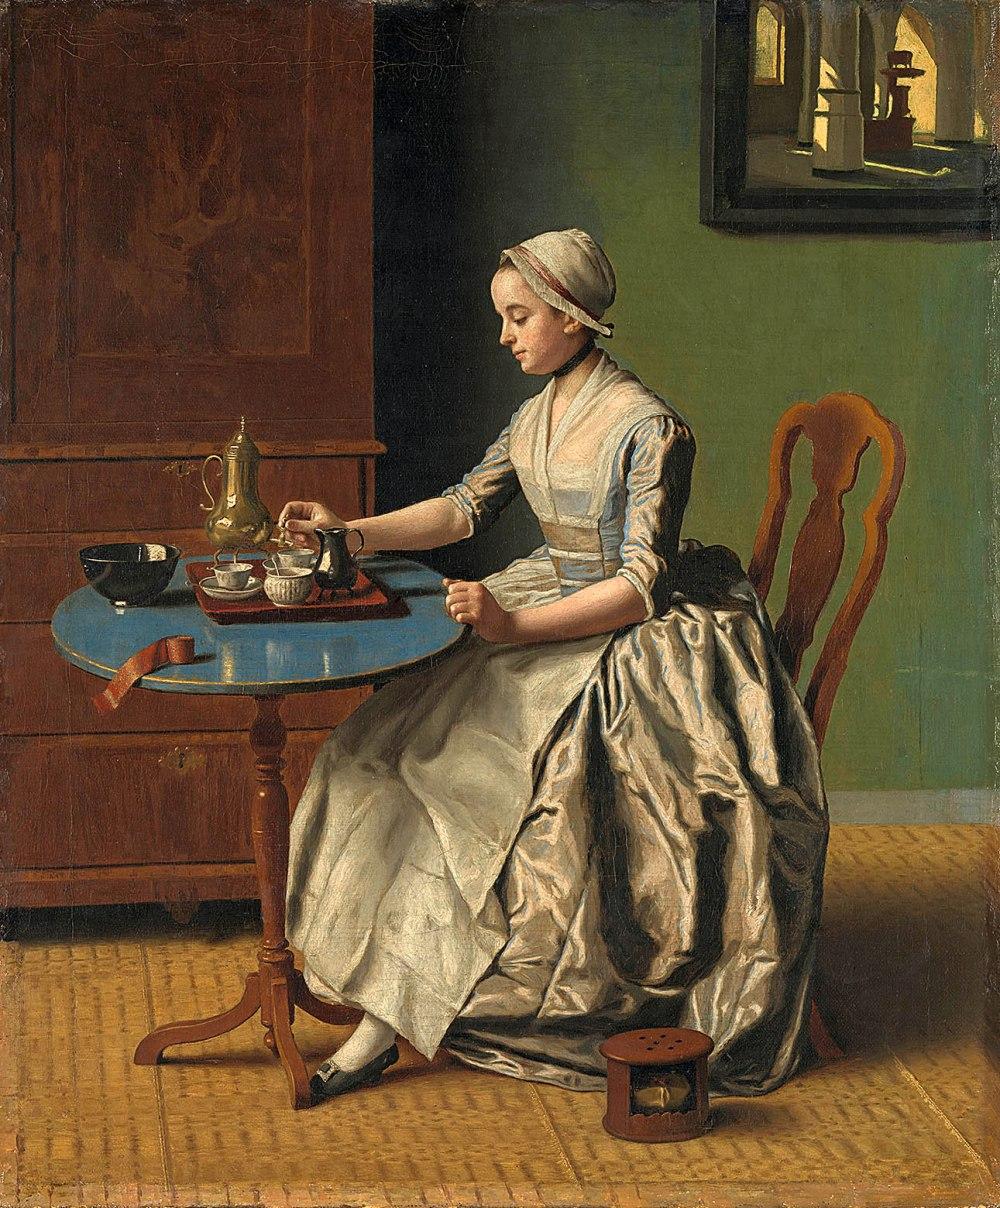 Jean-Étienne Liotard. Dama vertiendo chocolate. Hacia 1774. Rijksmuseum. Amsterdam.